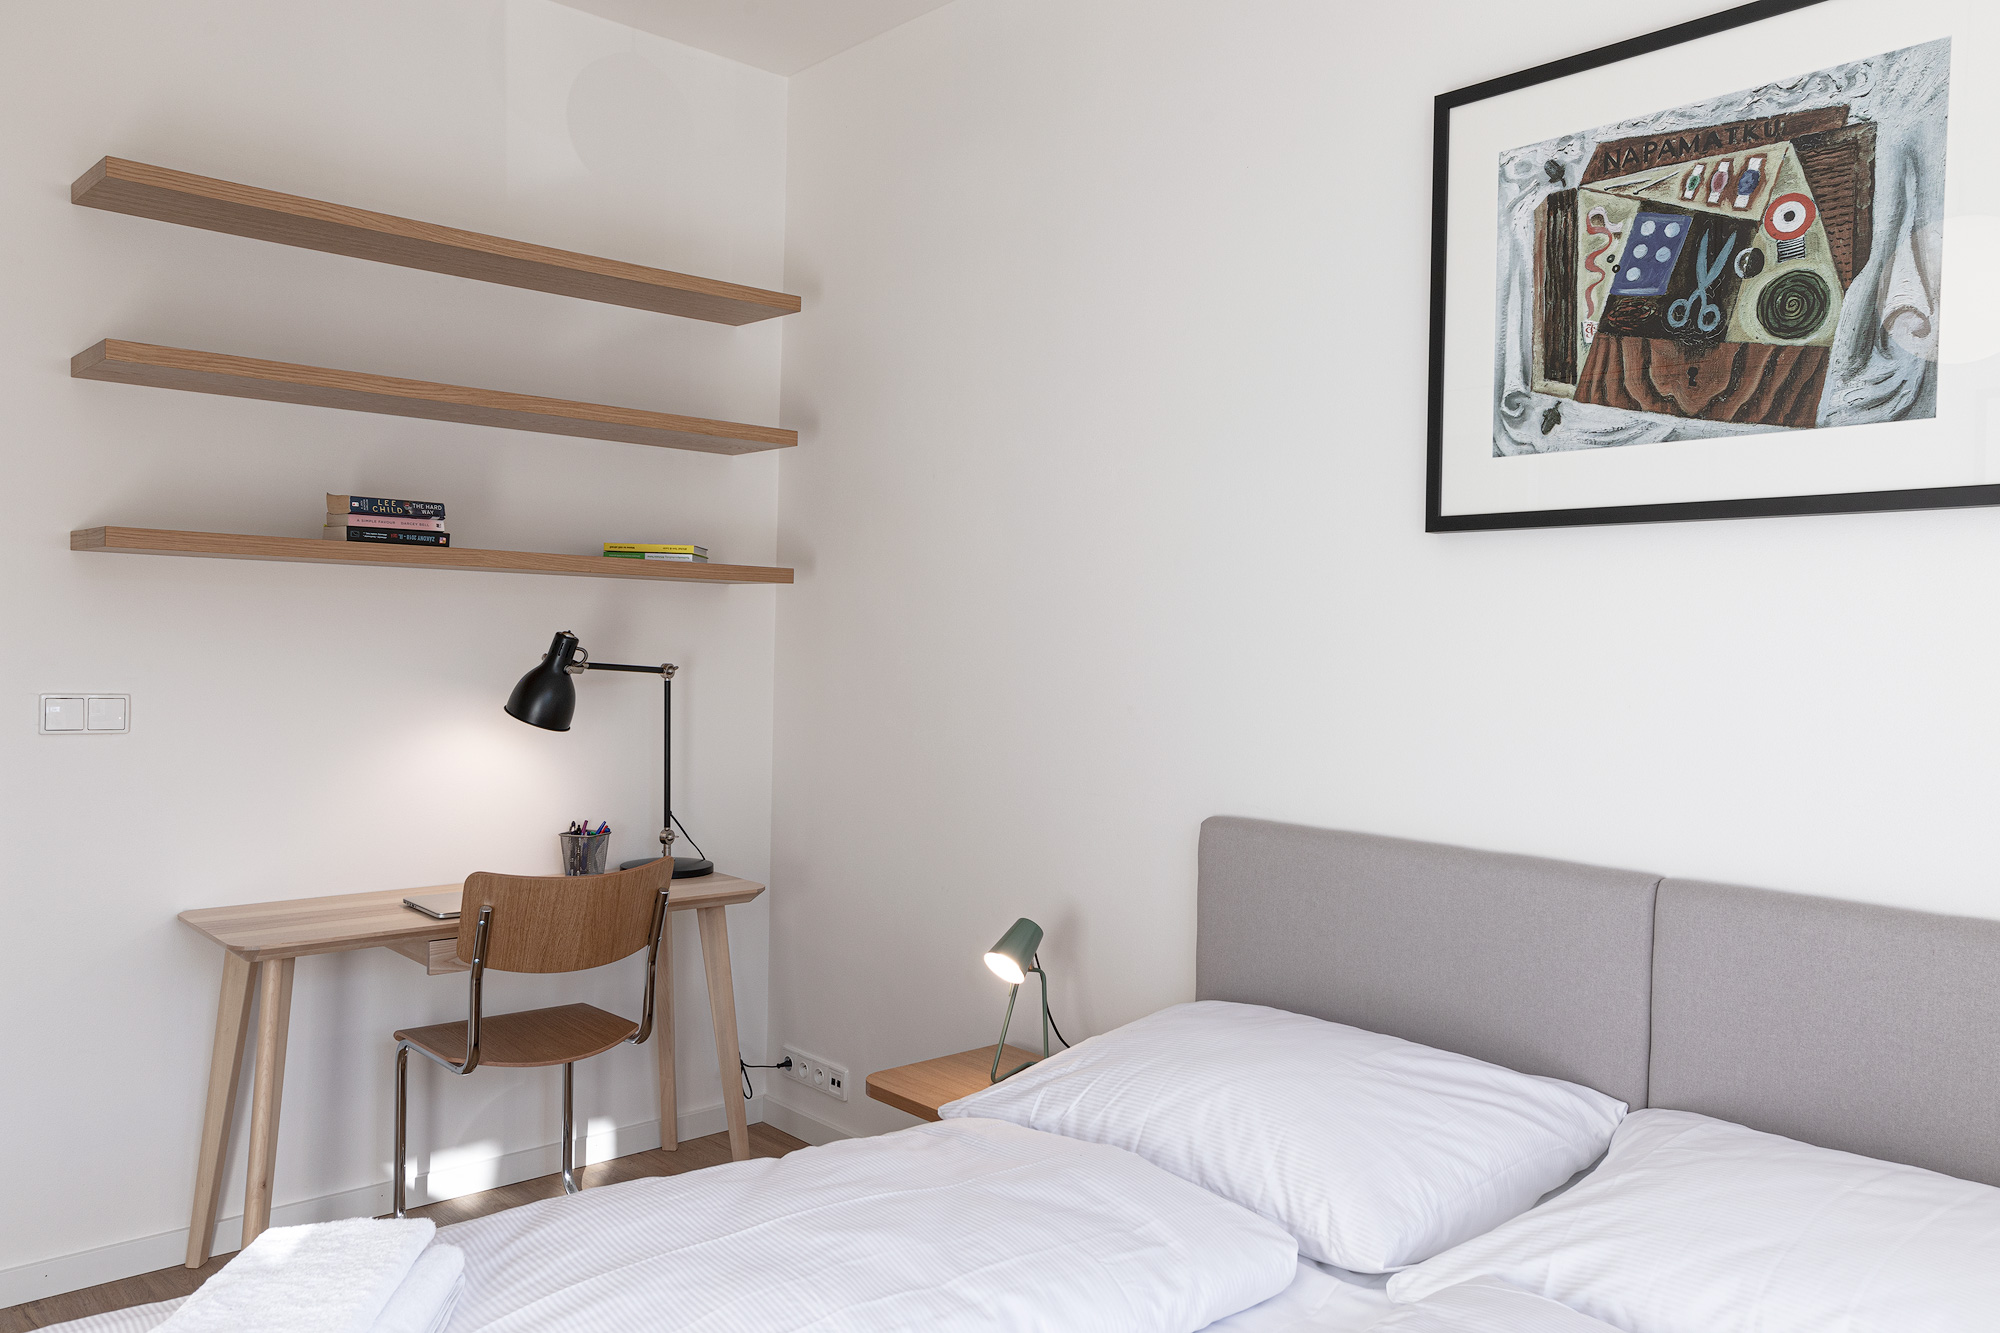 Apartment for rent, 2+kk - 1 bedroom, 37m2, in Prague